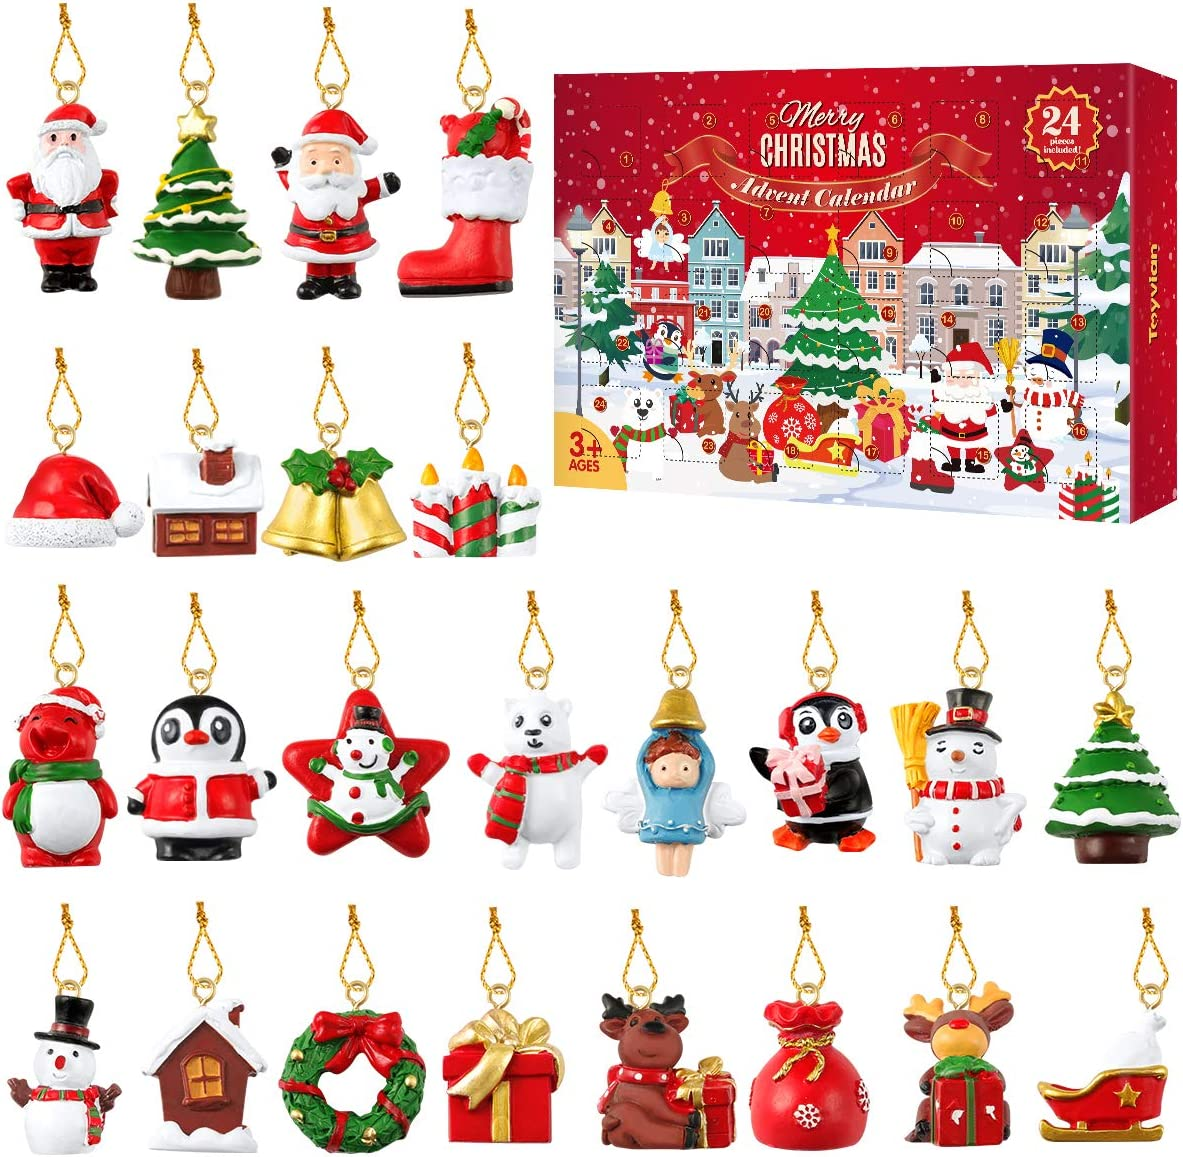 TOYANDONA Advent Calendar 20,20 Piece Christmas Countdown Calendar  Decoration Gift Box for Christmas Tree ,Mini Resin Christmas Ornaments